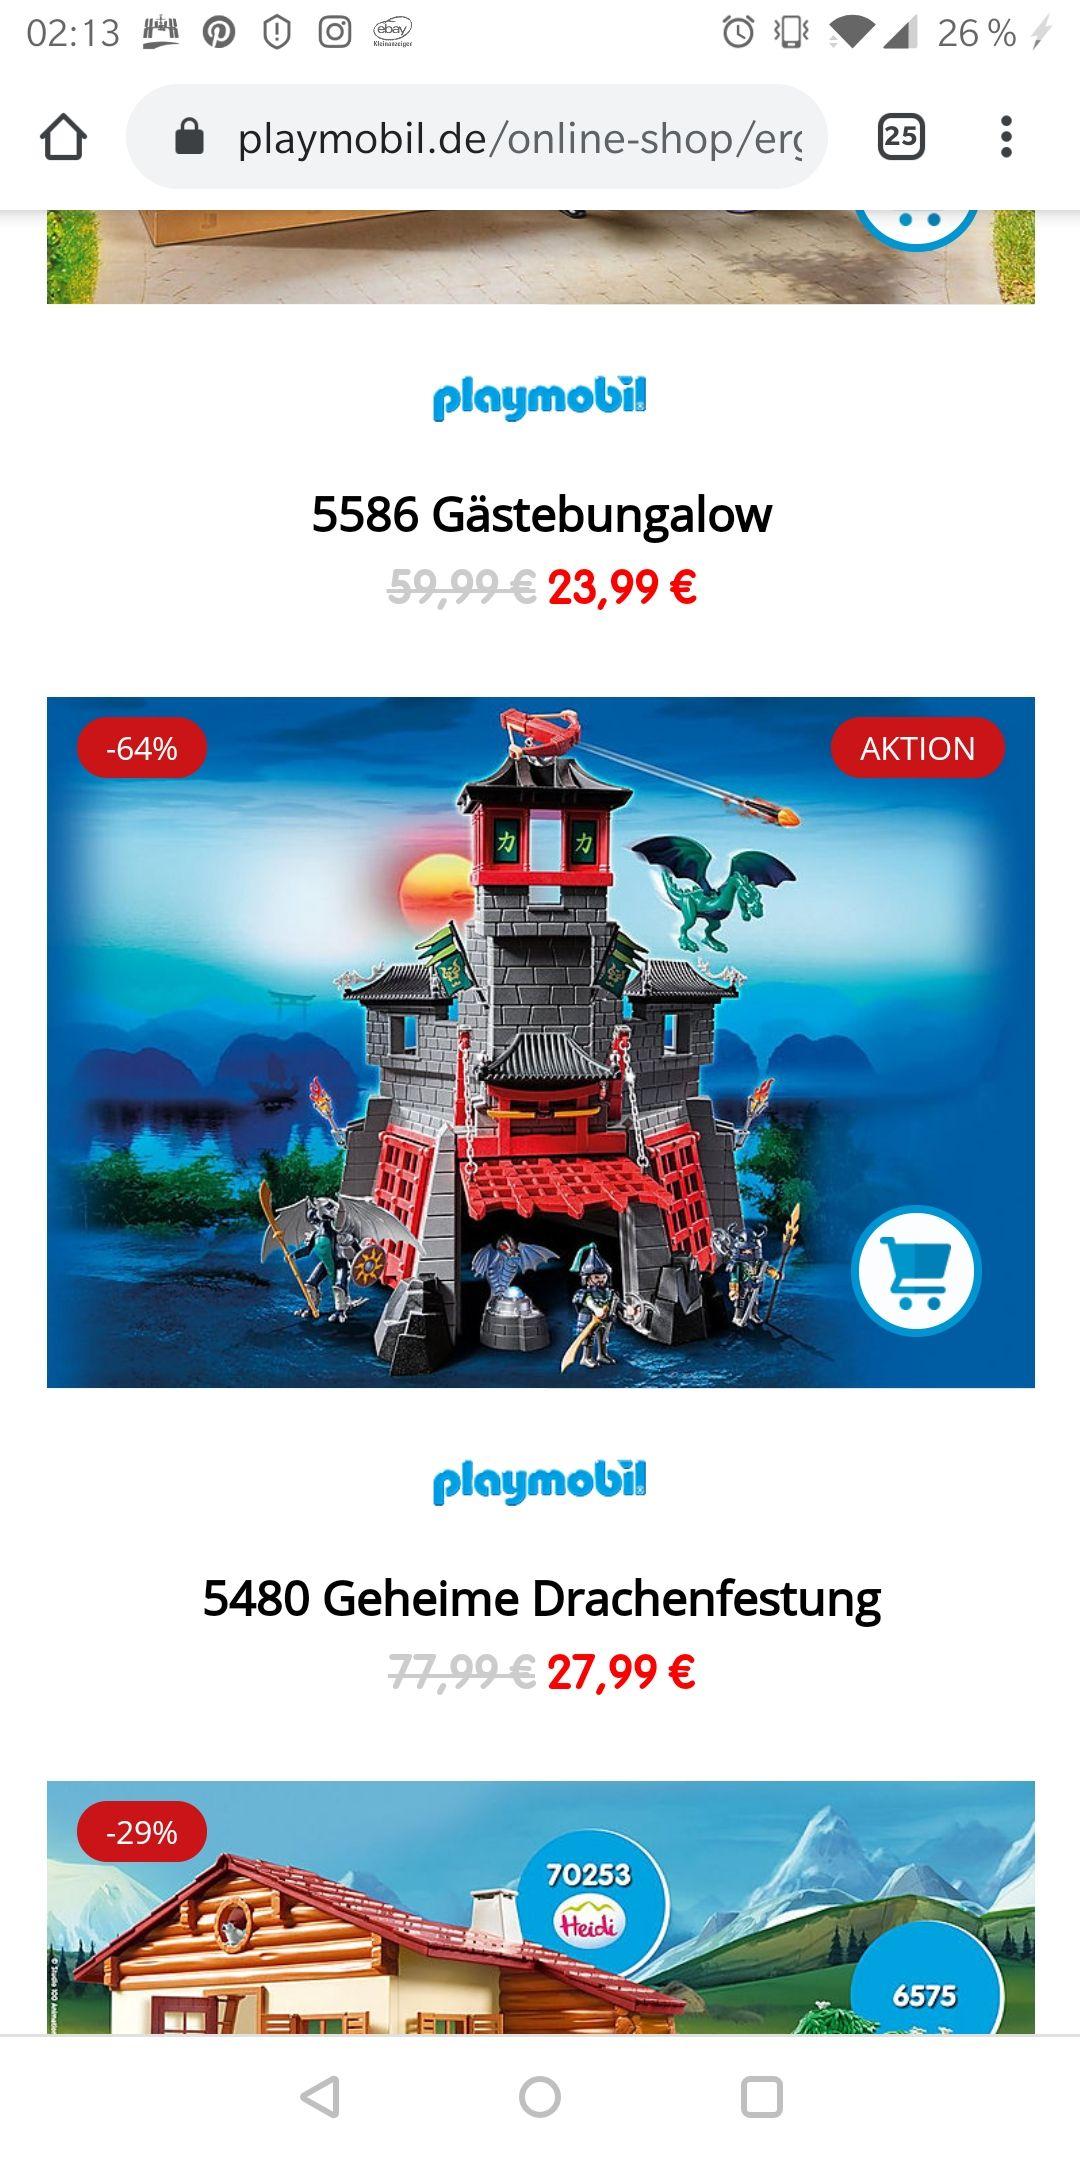 Playmobil 5480 Geheime Drachenfestung im Playmobil Onlineshop